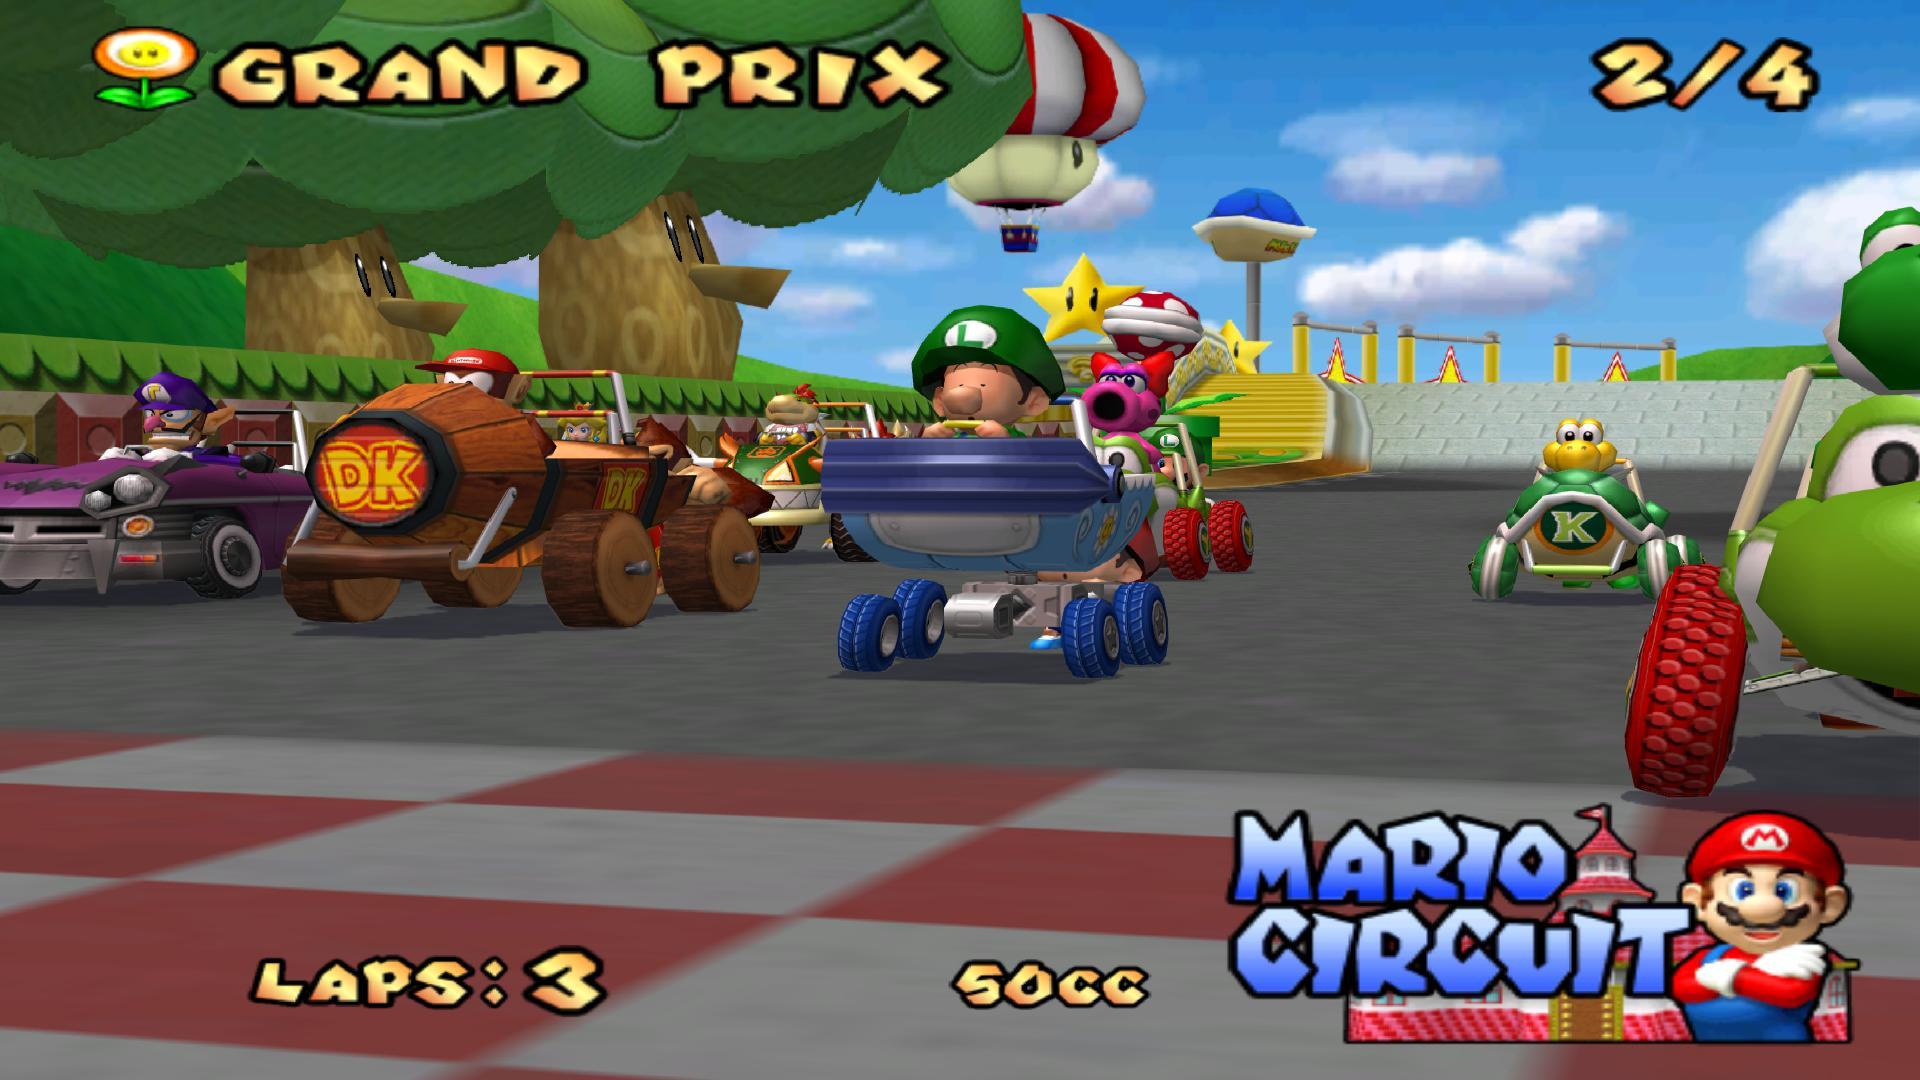 Mario kart gc iso download | Mario Party 7 (USA) GameCube ISO  2019